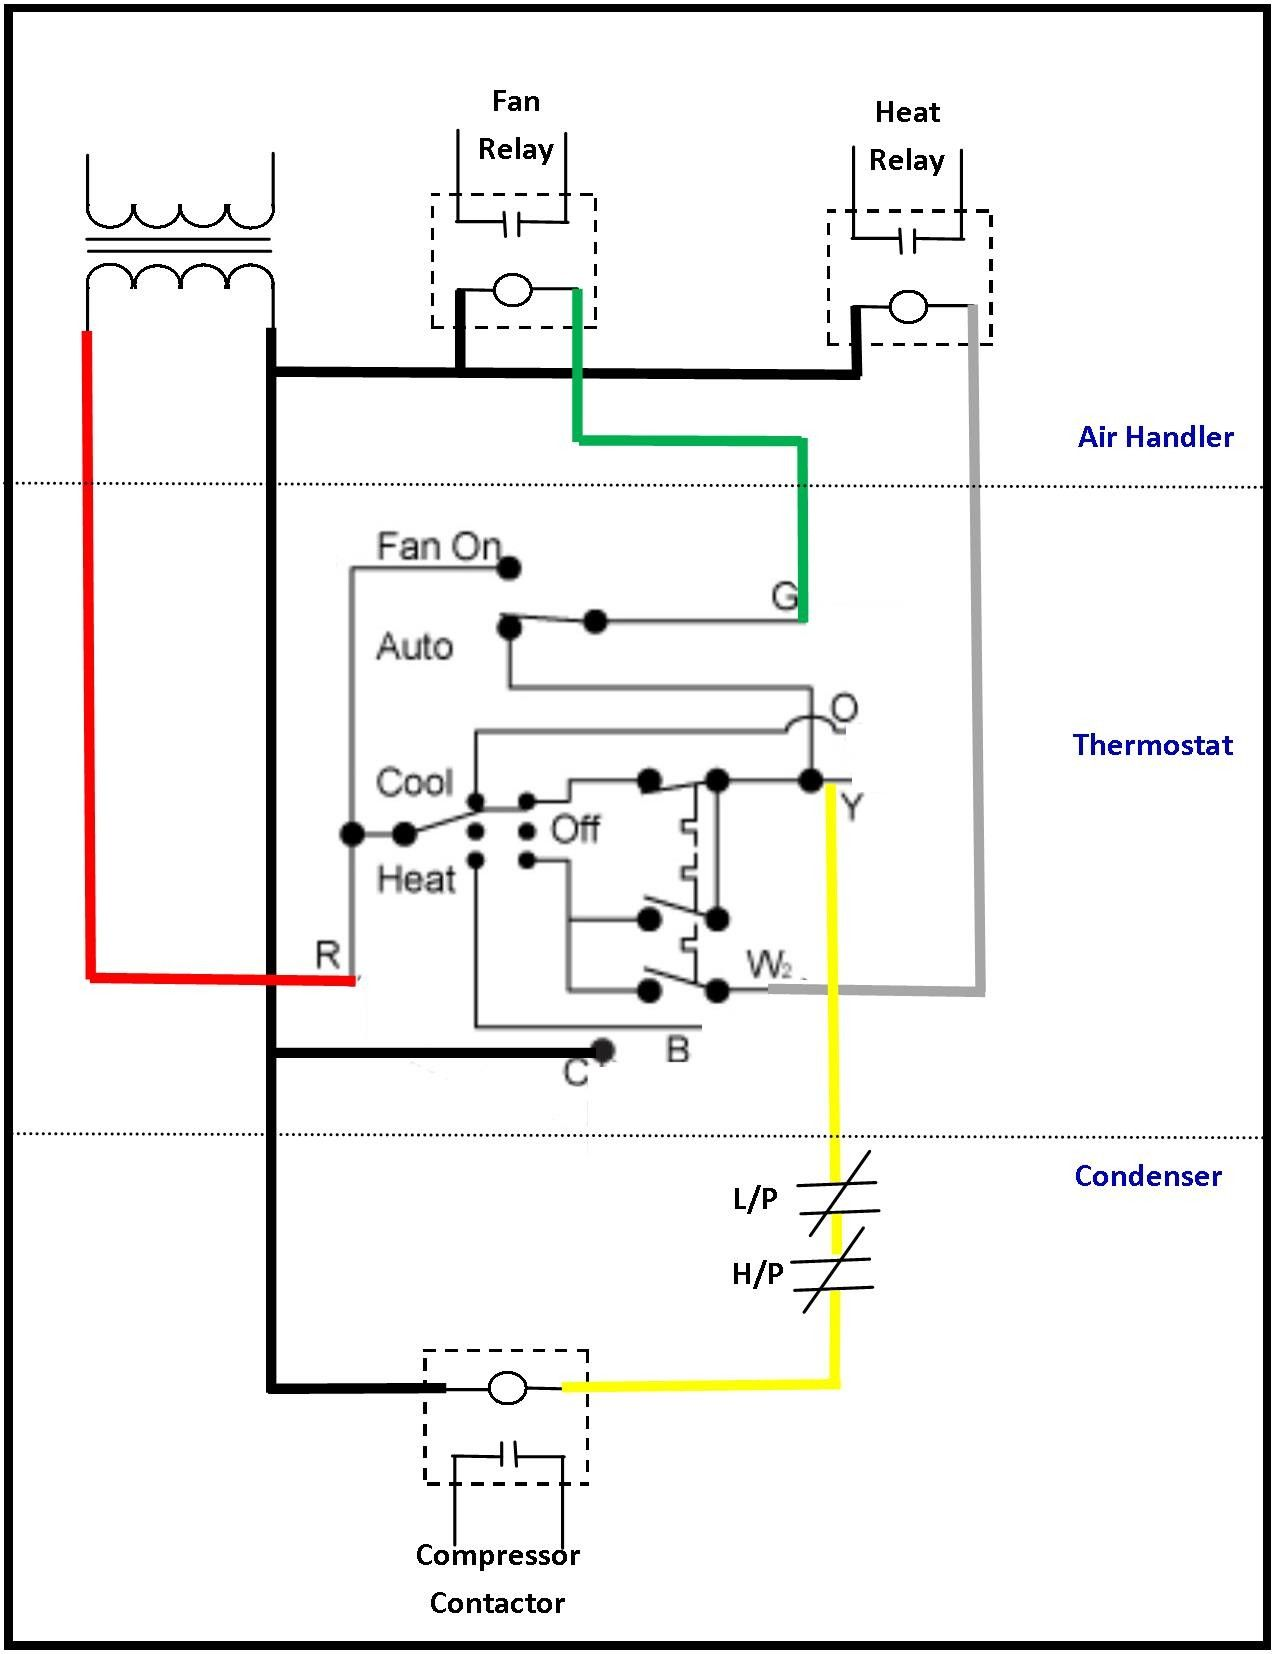 new industrial exhaust fan wiring diagram diagram diagramsamplenew industrial exhaust fan wiring diagram diagram diagramsample diagramtemplate [ 1275 x 1654 Pixel ]